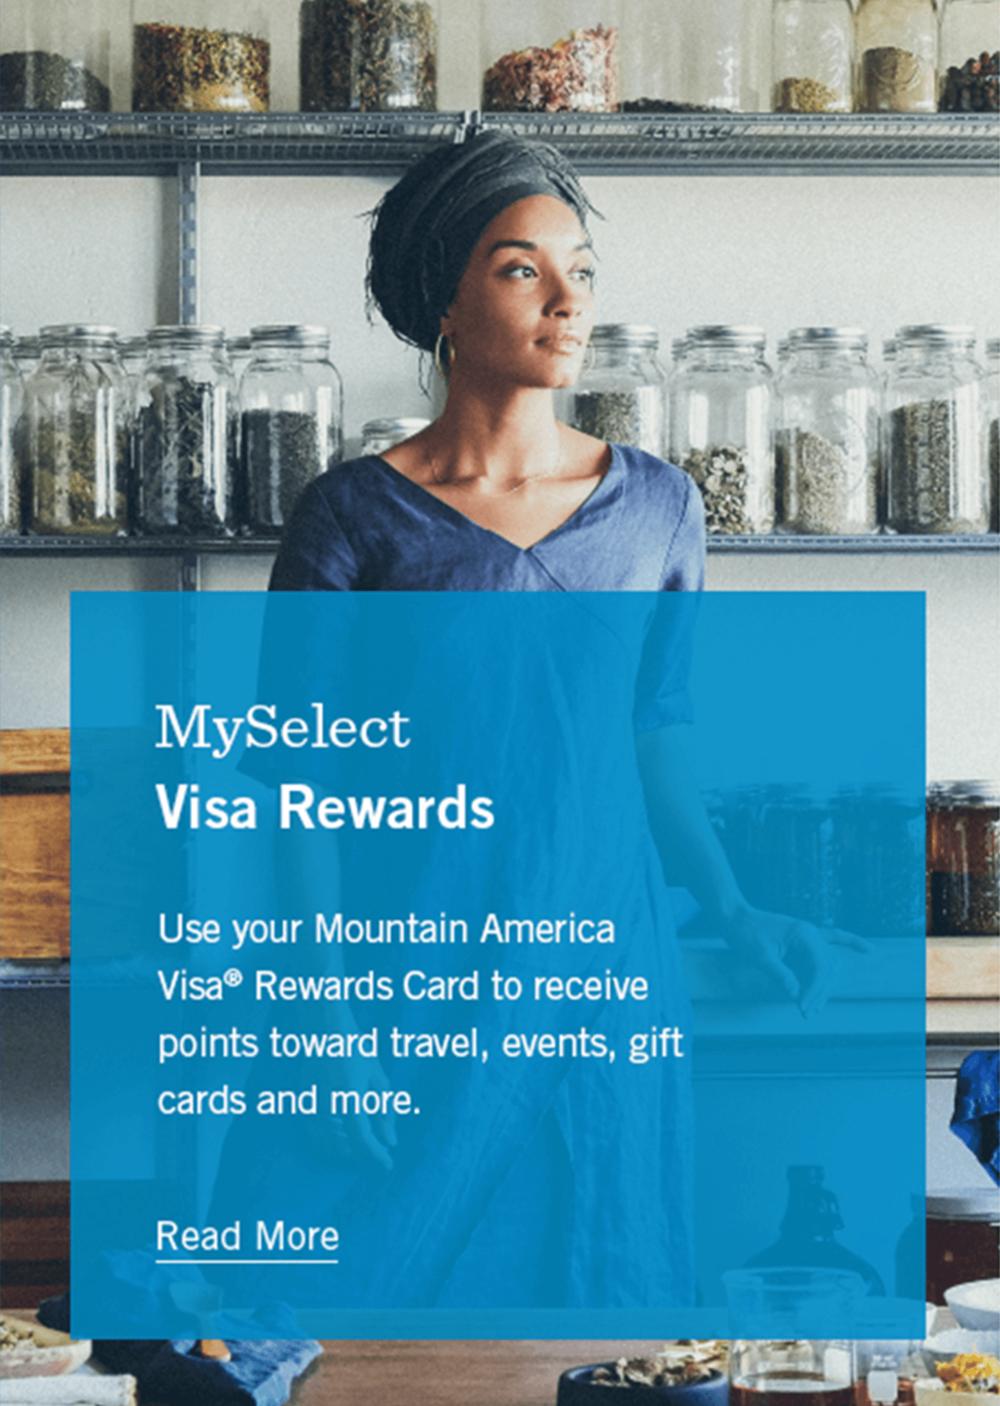 MySelect Visa Rewards Advertisement